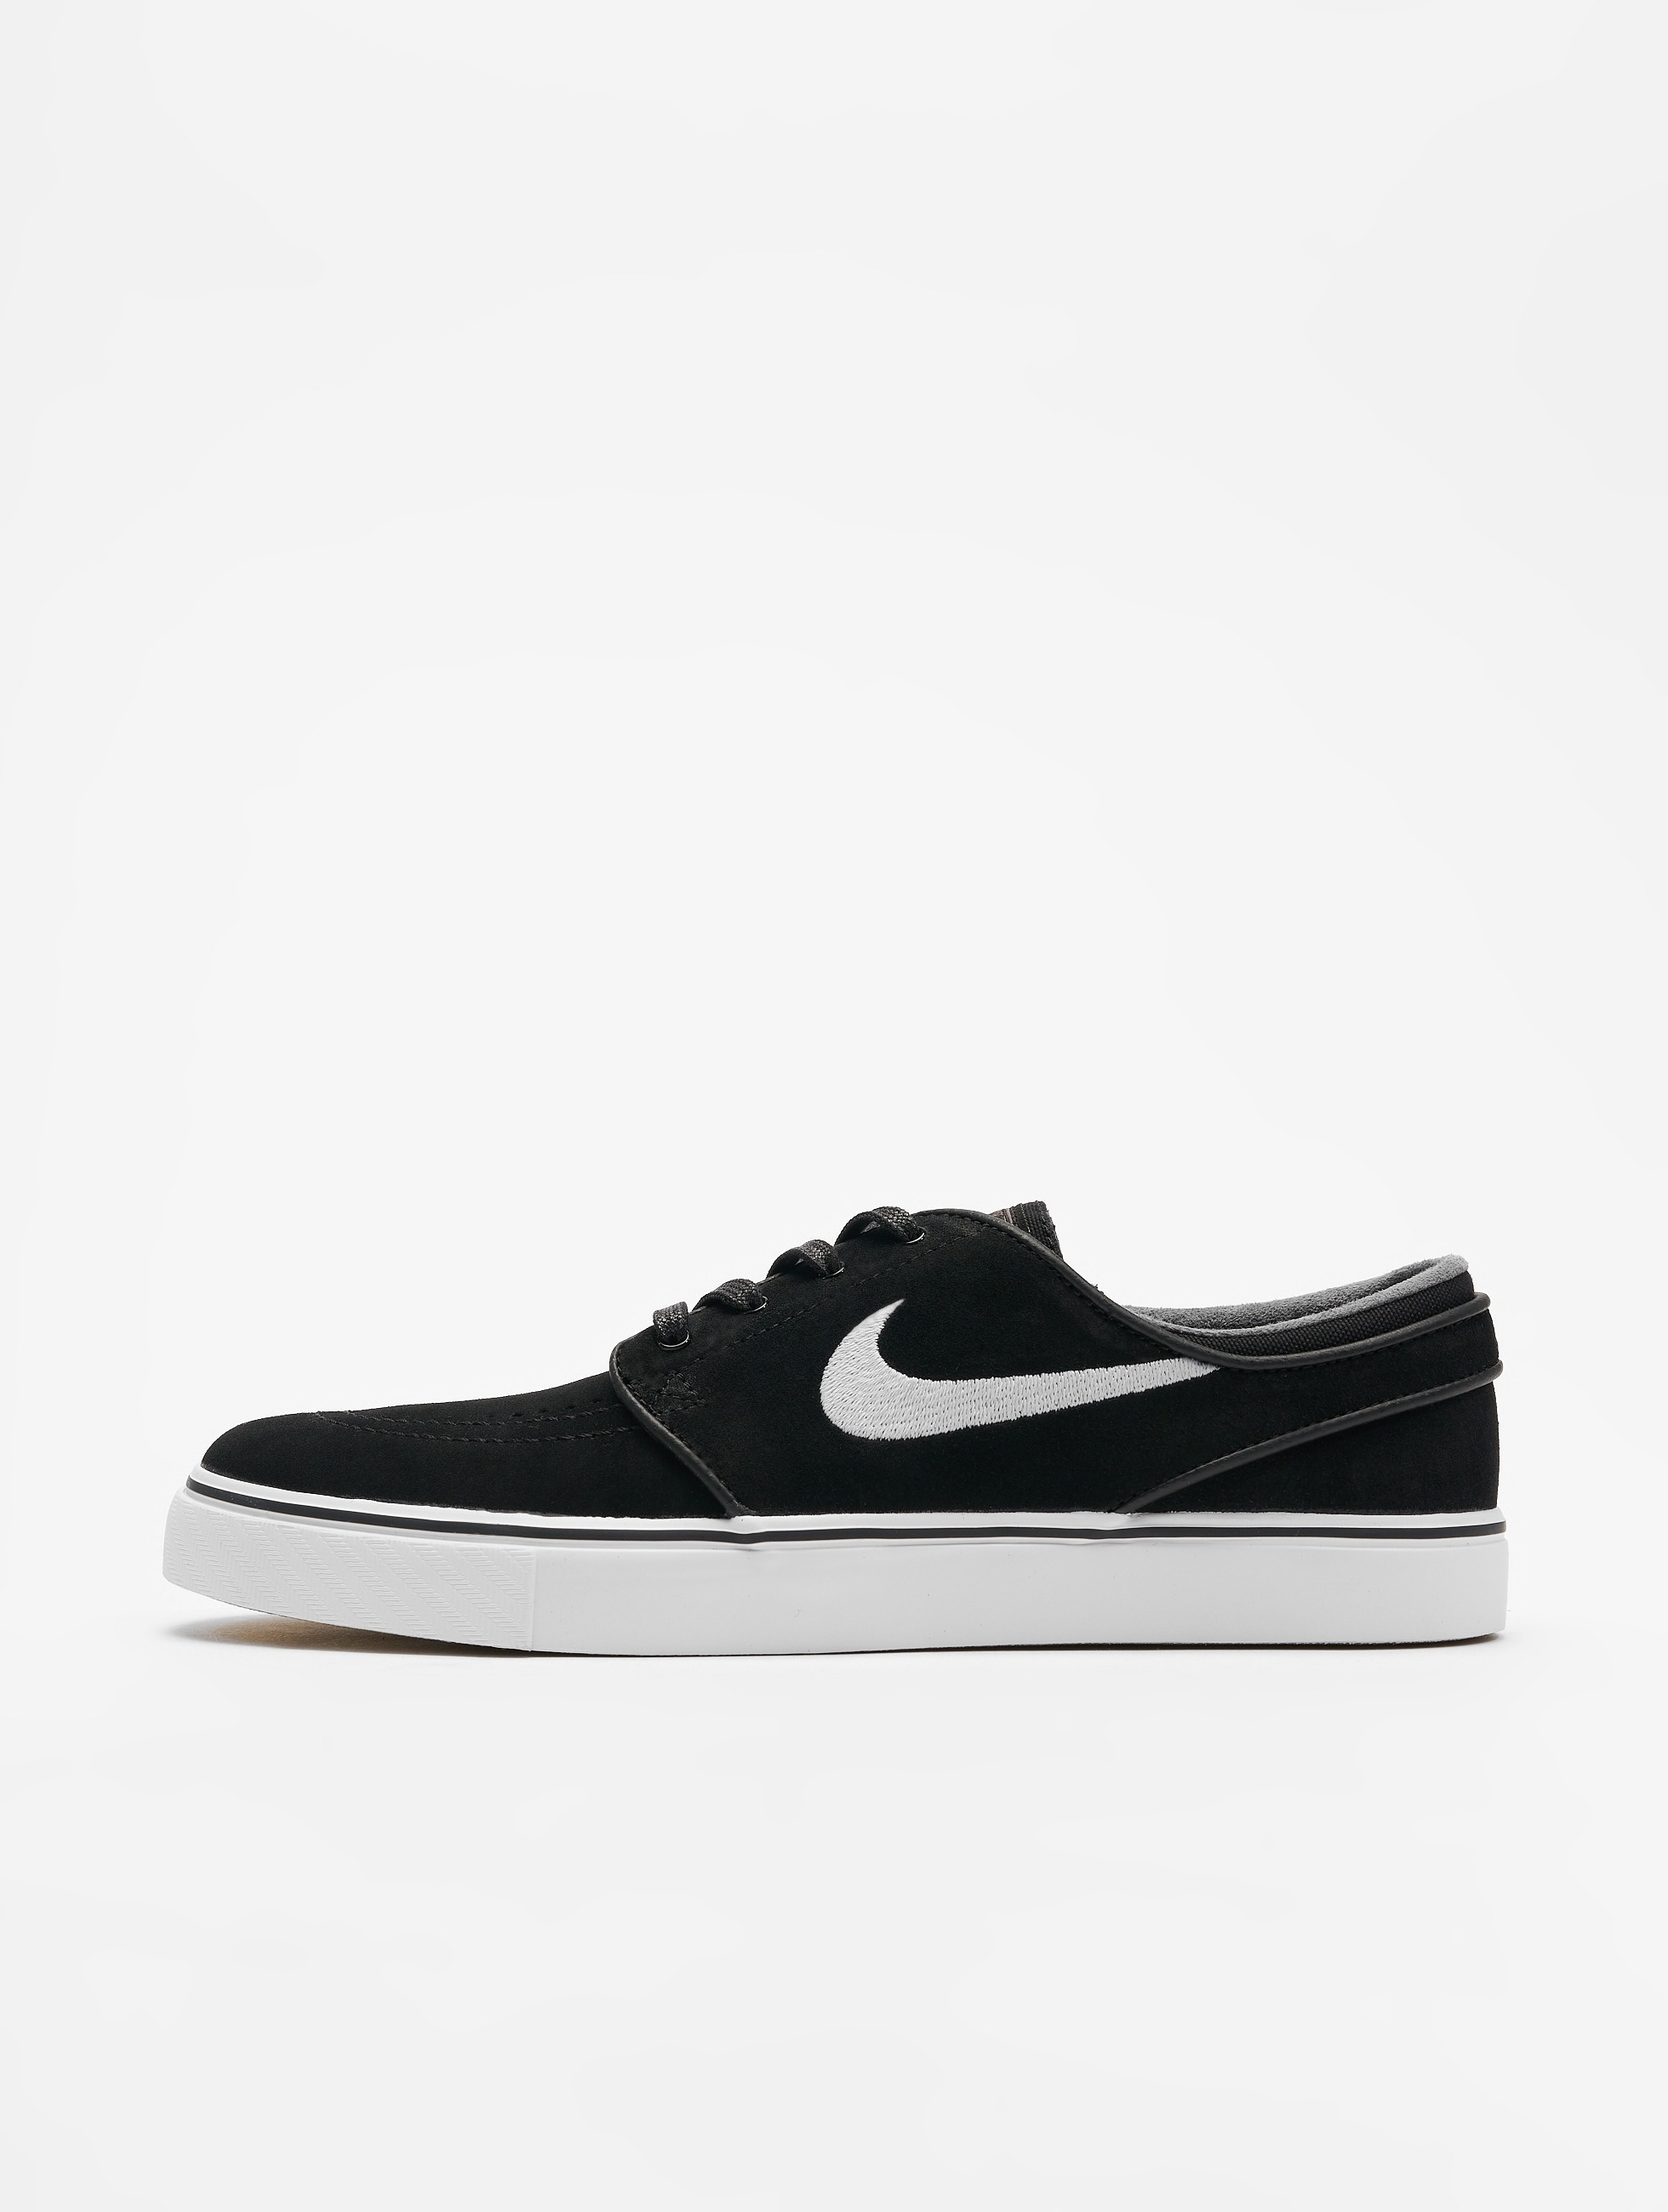 Nike SB Zoom Stefan Janoski Sneakers BlackWhiteThunder GreyGum Light Brown